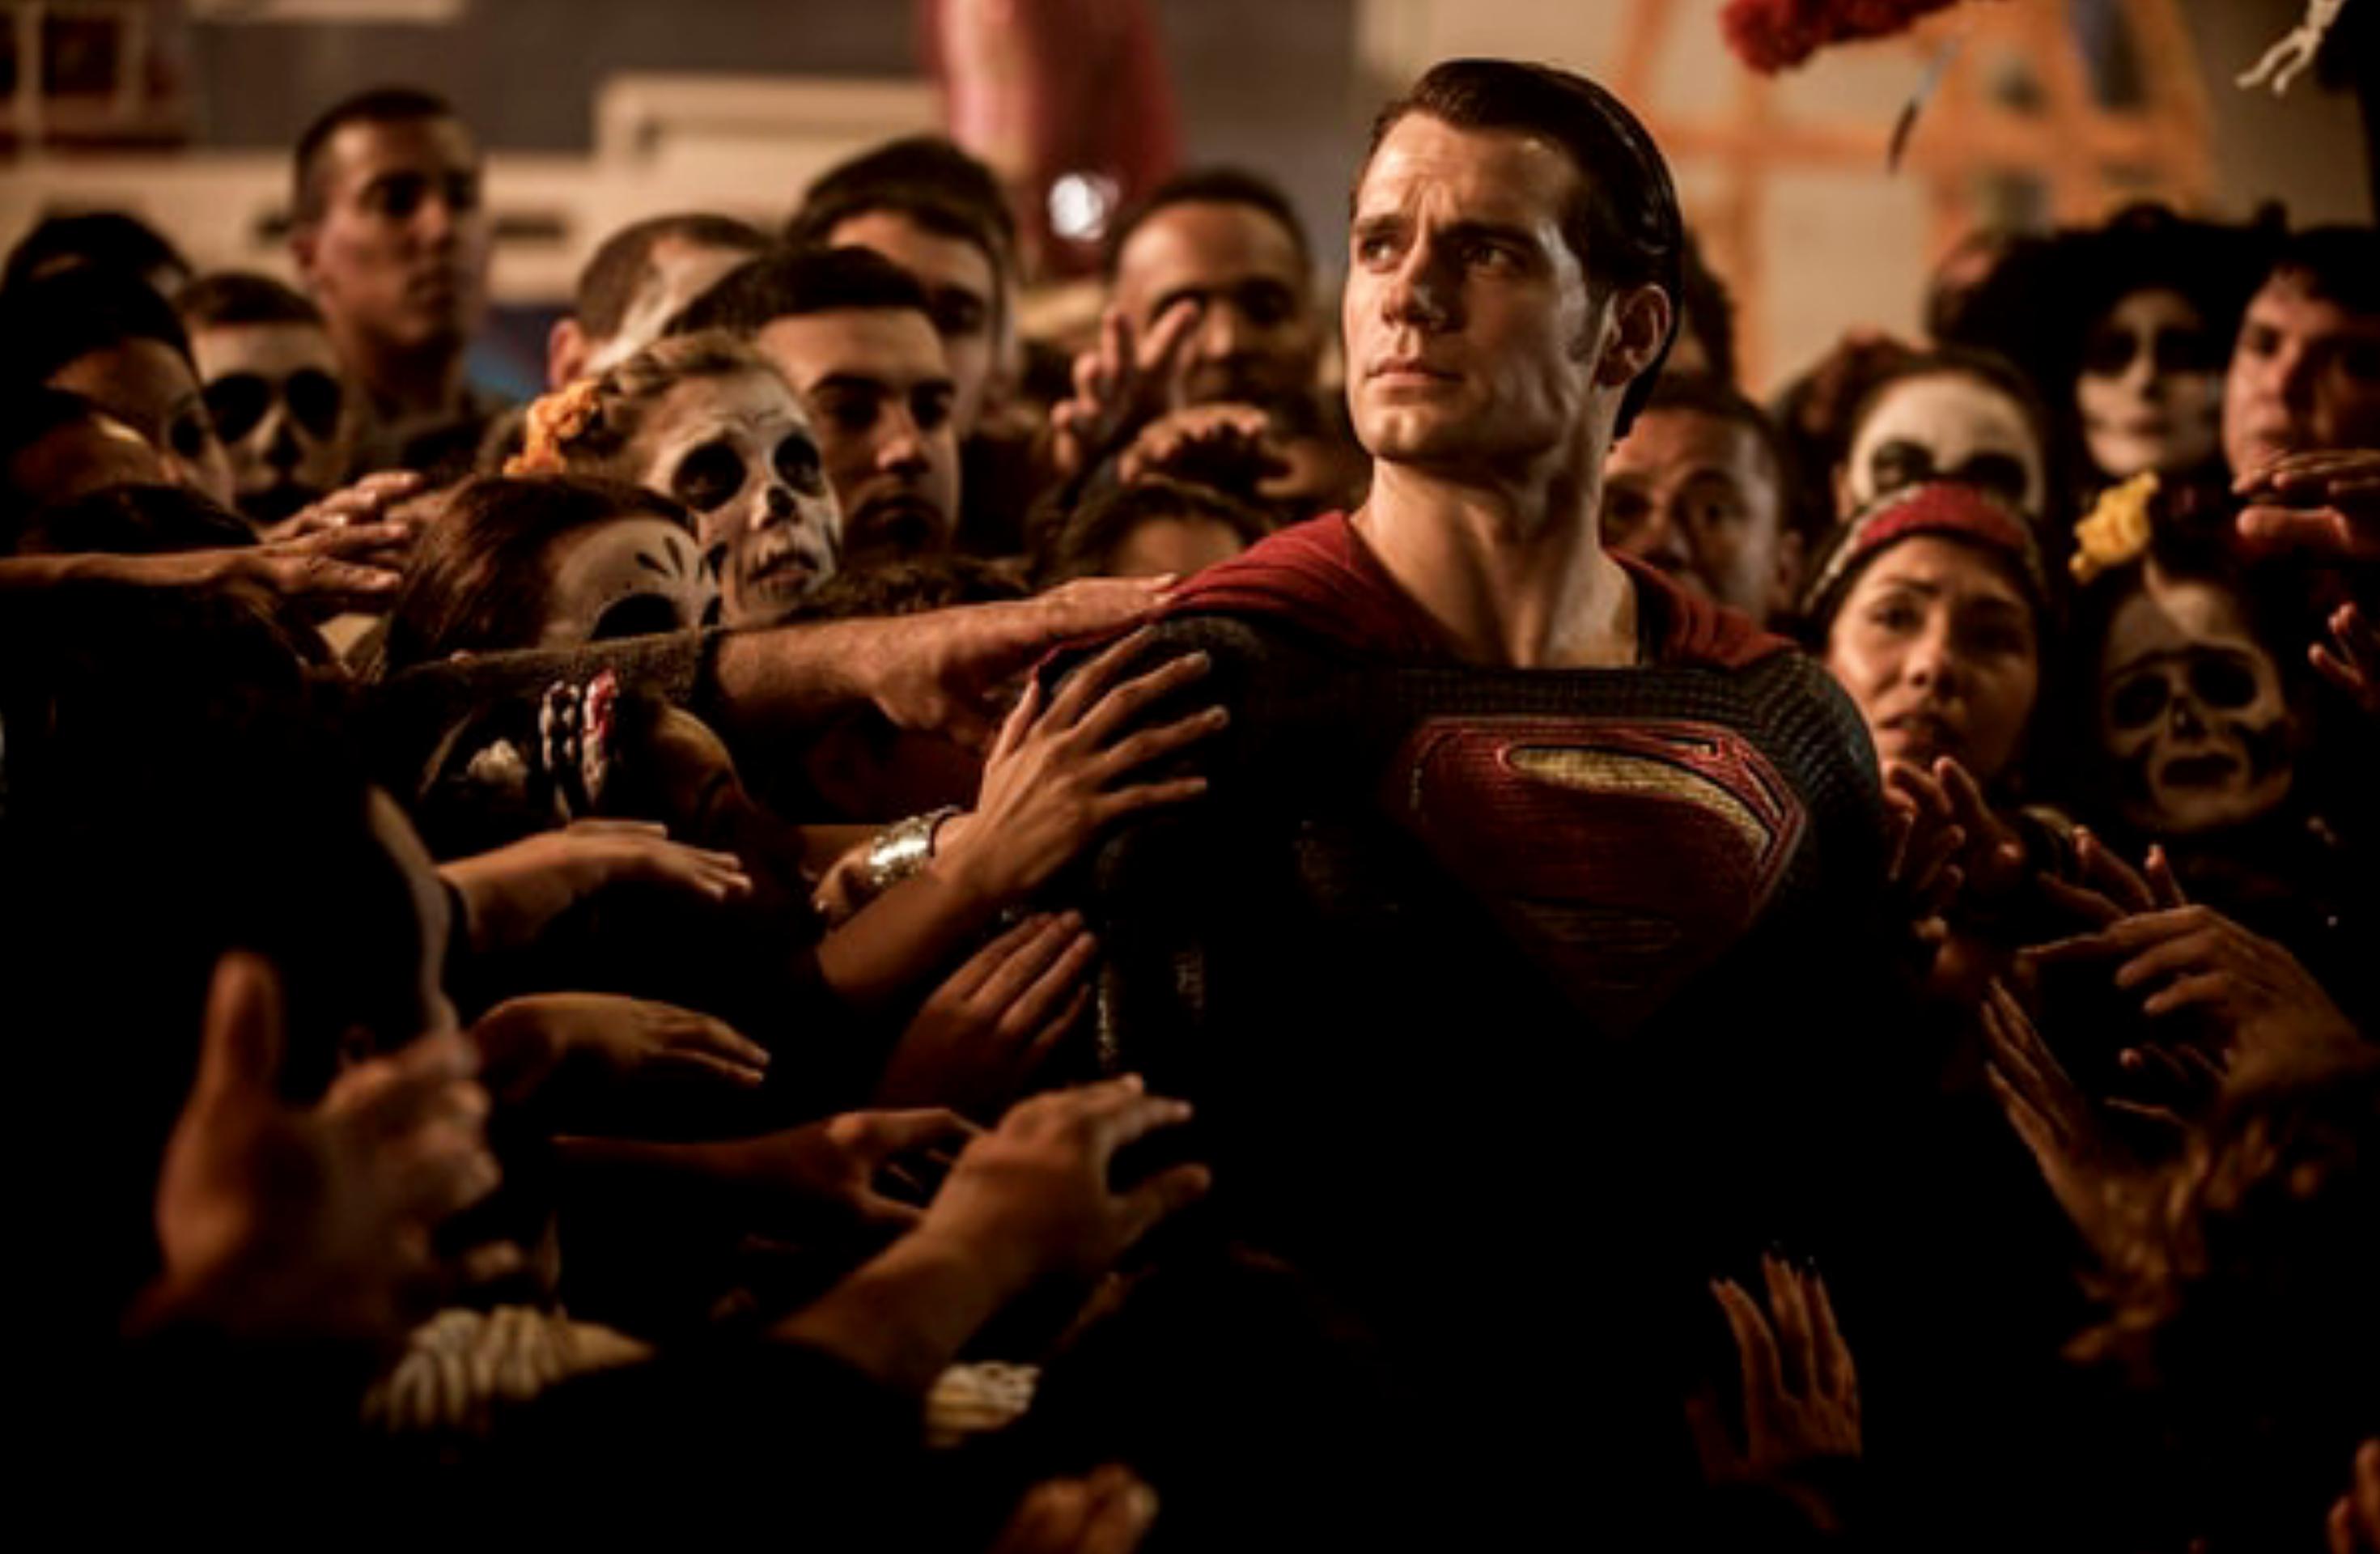 https://www.warnerbros.com/movies/batman-v-superman-dawn-justice/